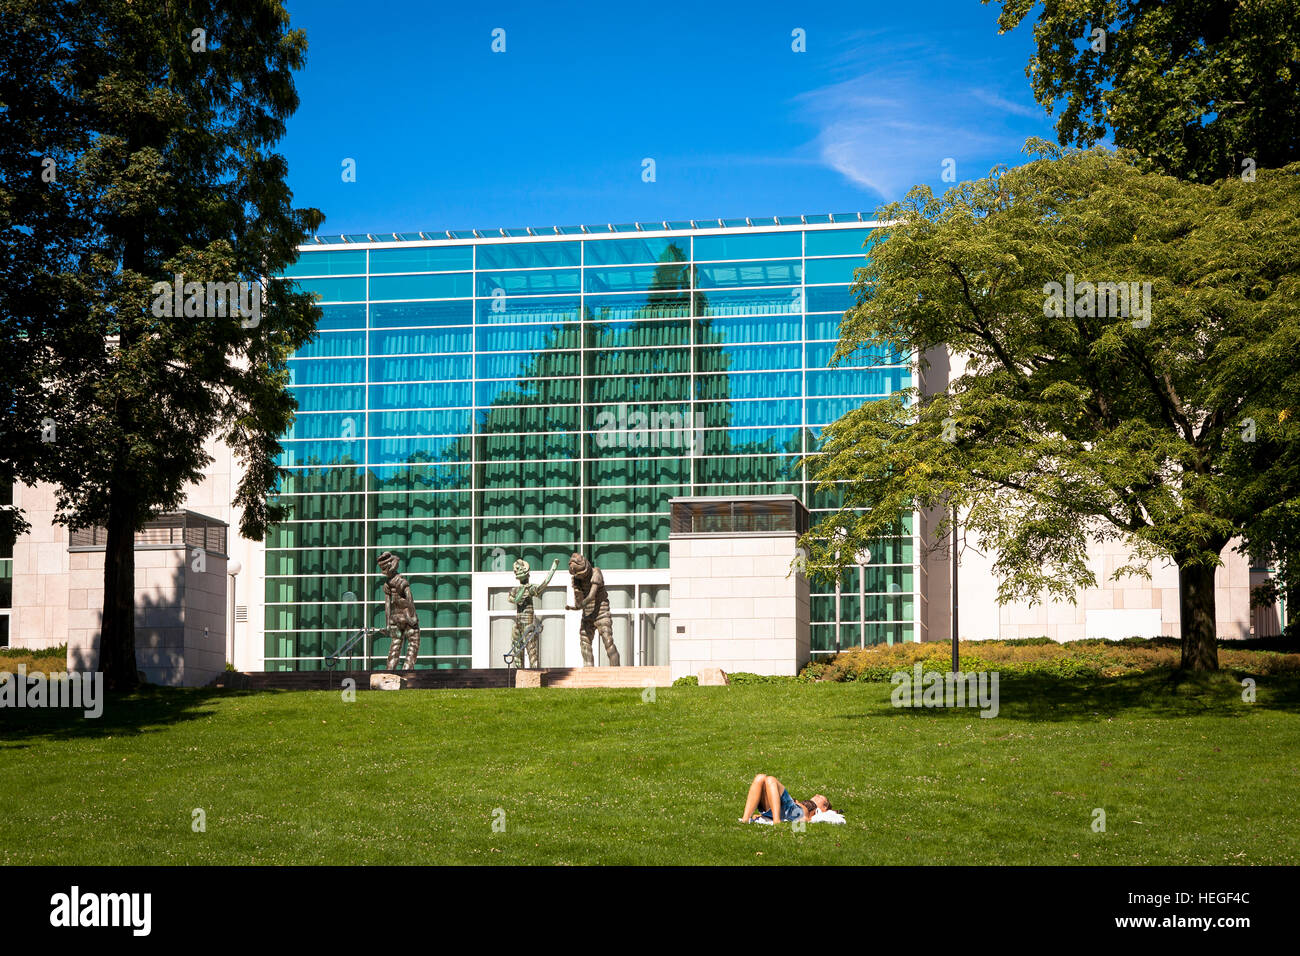 DEU, Germany, Ruhr area, Essen, the Philharmonie, Saalbau. Stock Photo